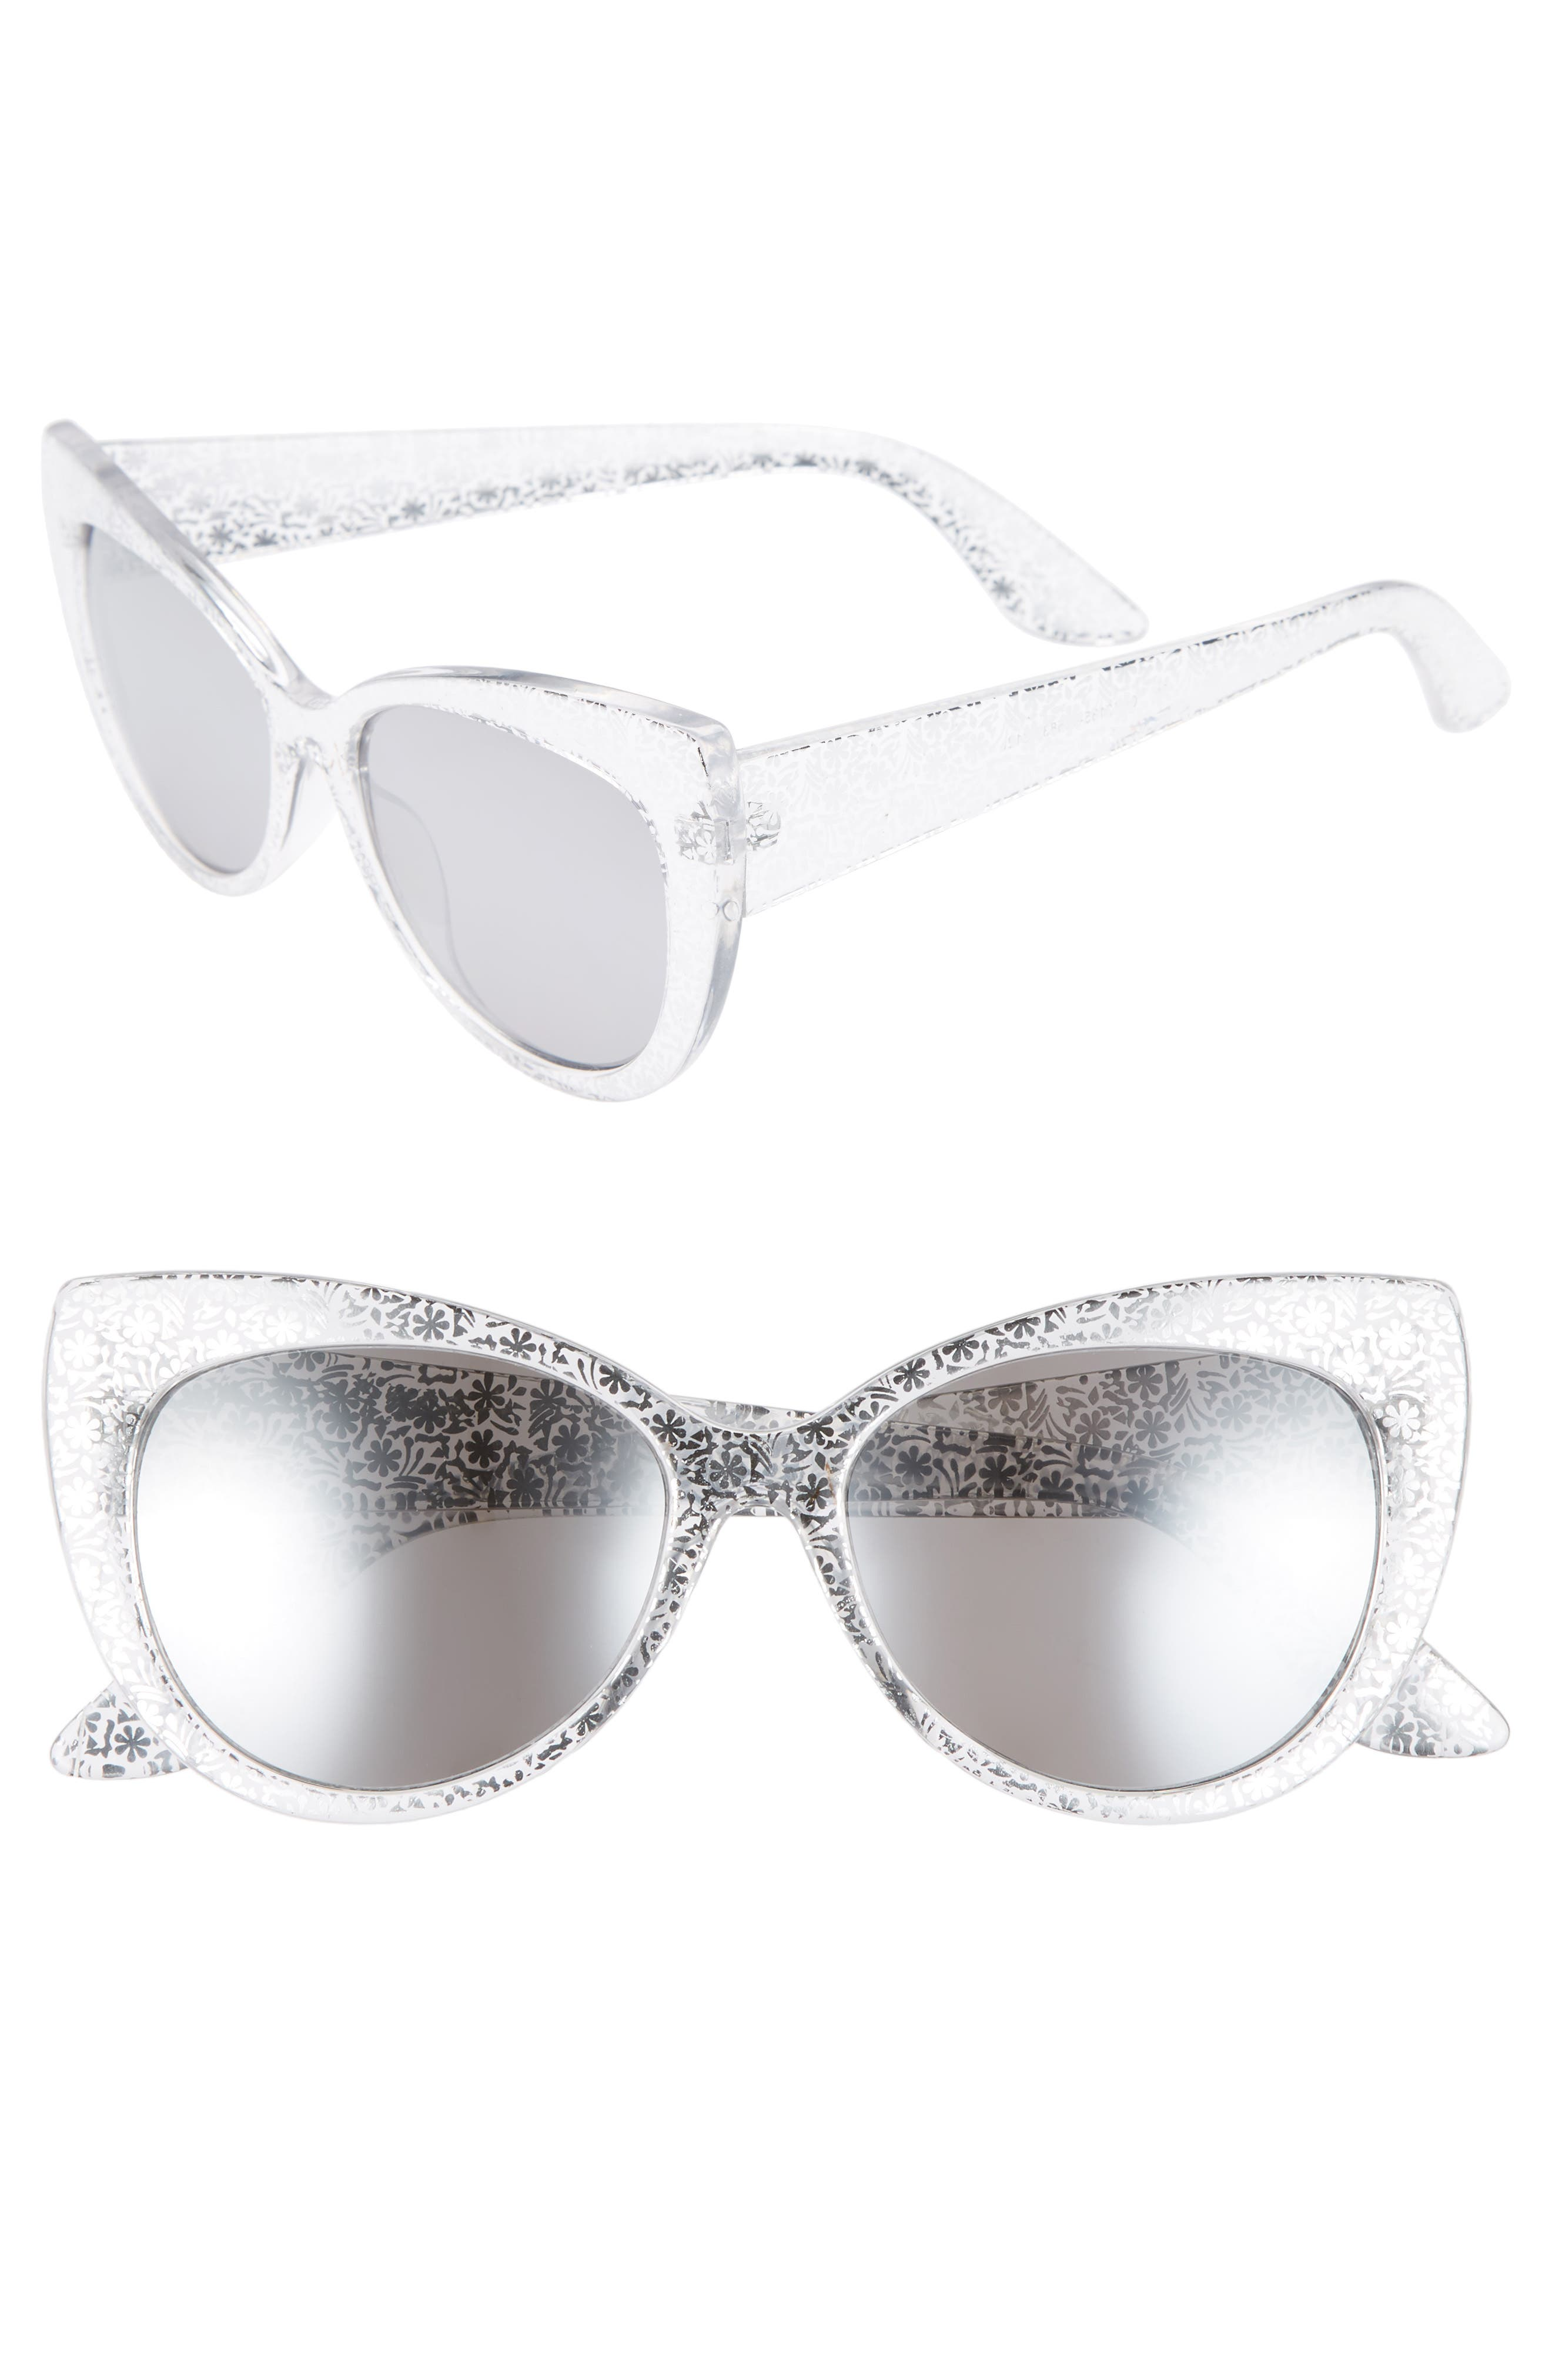 55mm Floral Cat Eye Sunglasses,                             Main thumbnail 1, color,                             040